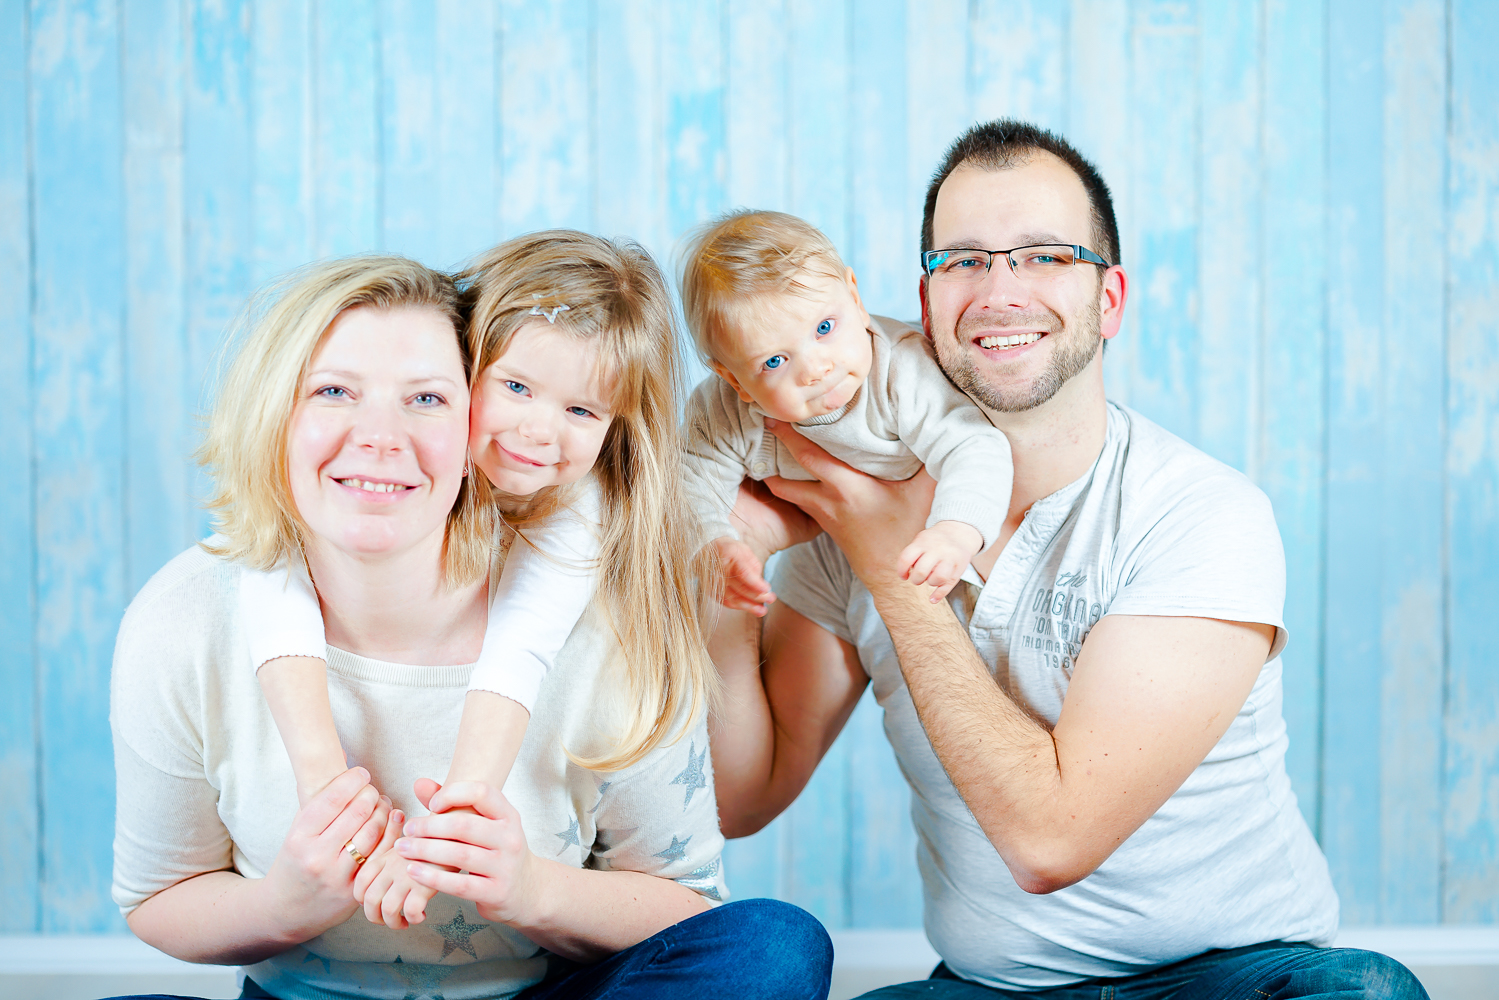 Familienfotografie 1